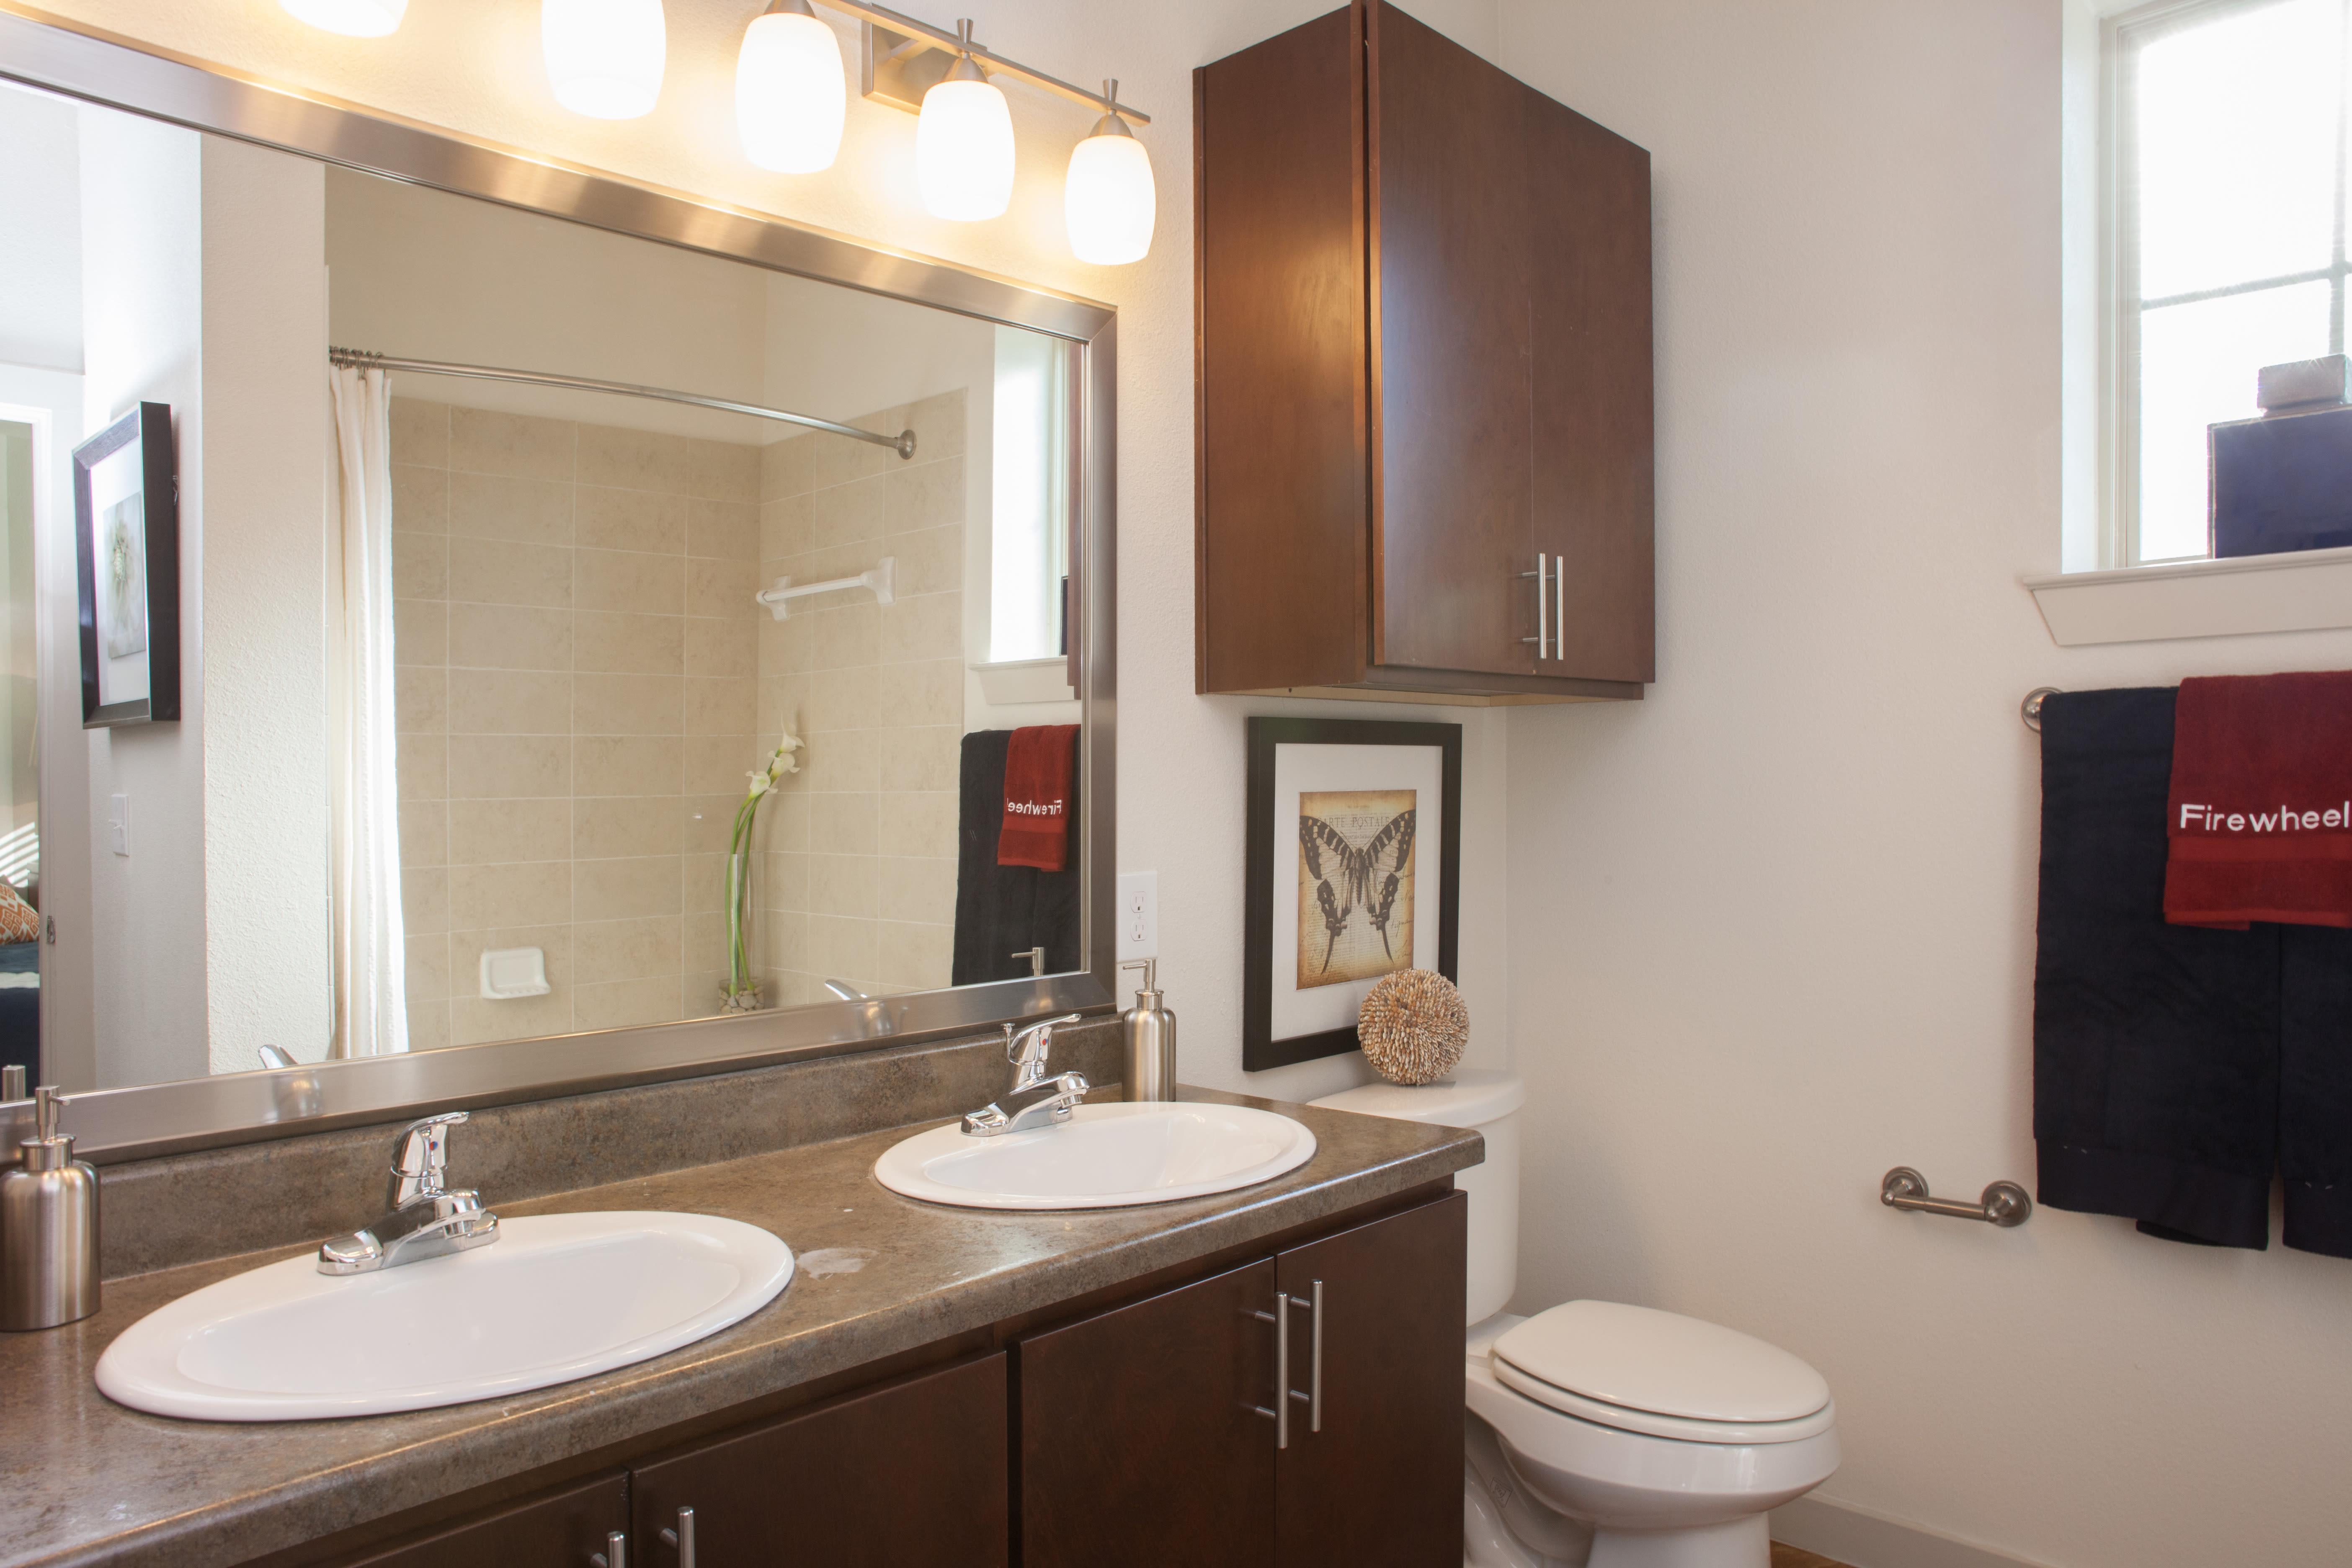 Two sinks in main bathroom at Firewheel Apartments in San Antonio